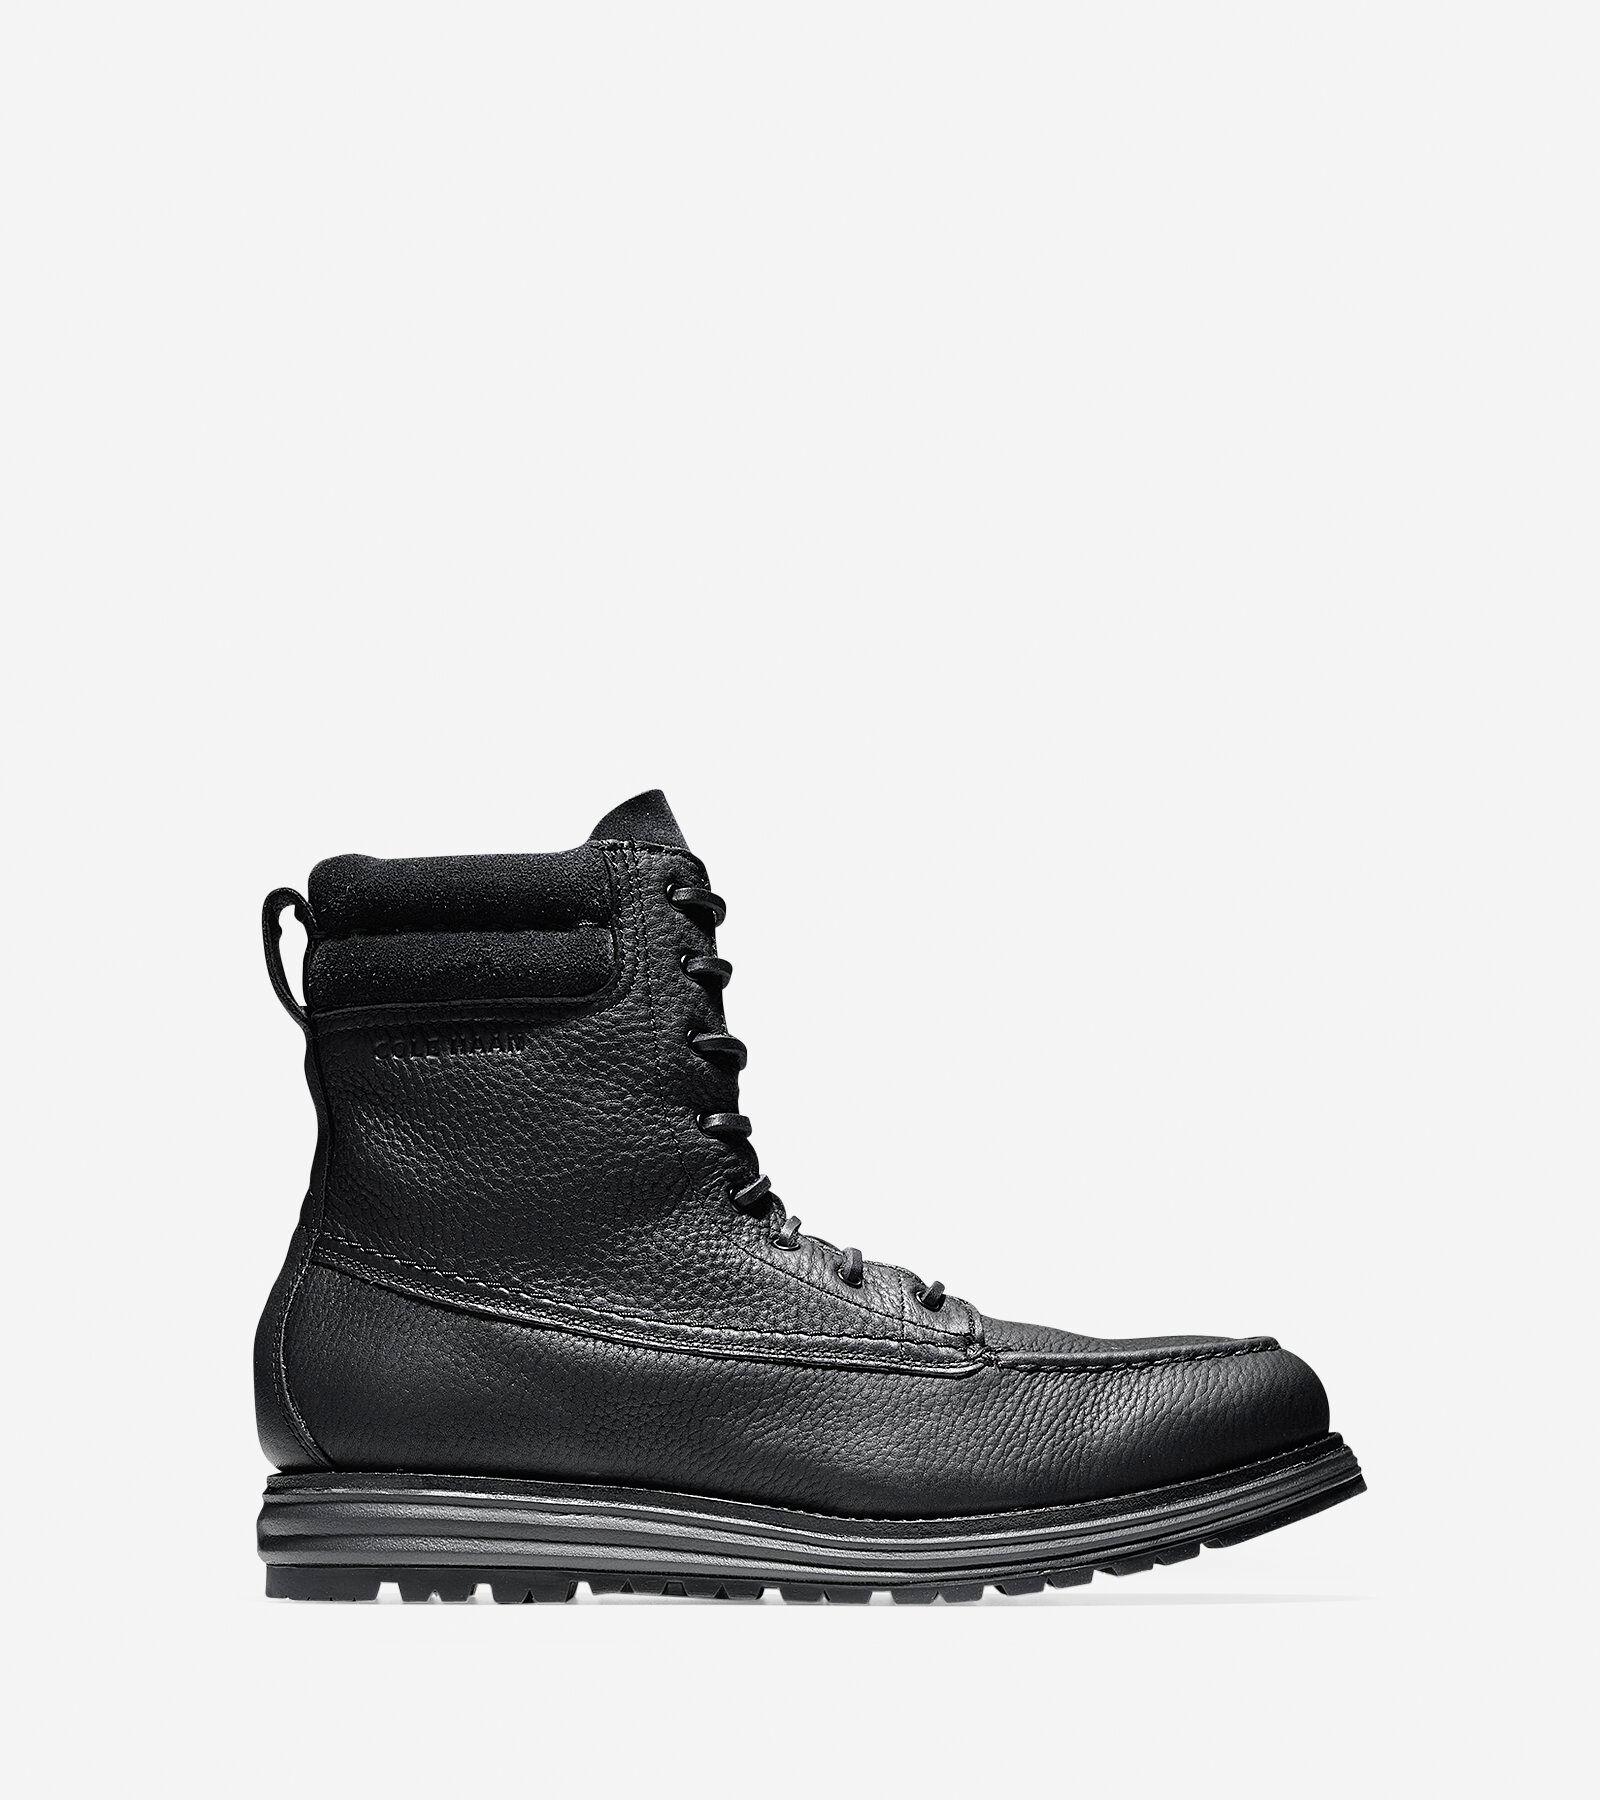 Cole Haan Lockridge Leather Moc-... largest supplier cheap online free shipping reliable cheap sale release dates outlet purchase gHUUsc0lfJ